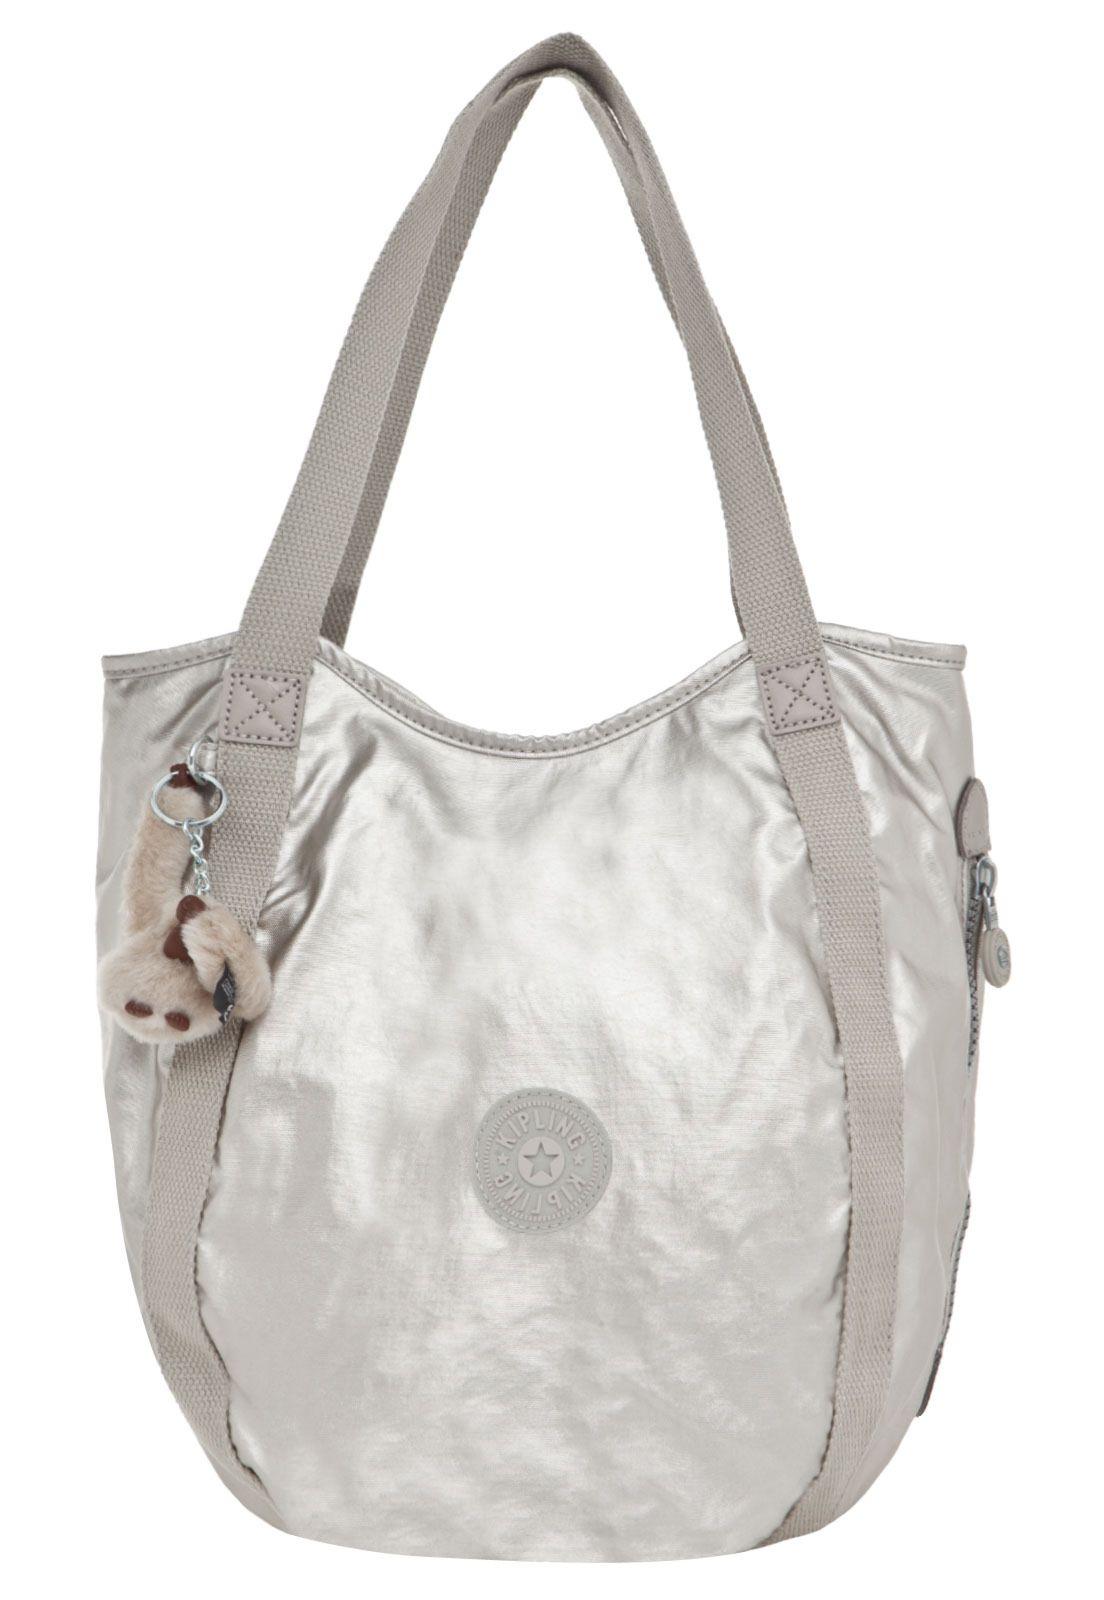 Bolsa Kipling Balloon Silver Beige Bege - Compre Agora   Dafiti ... 8373817bde